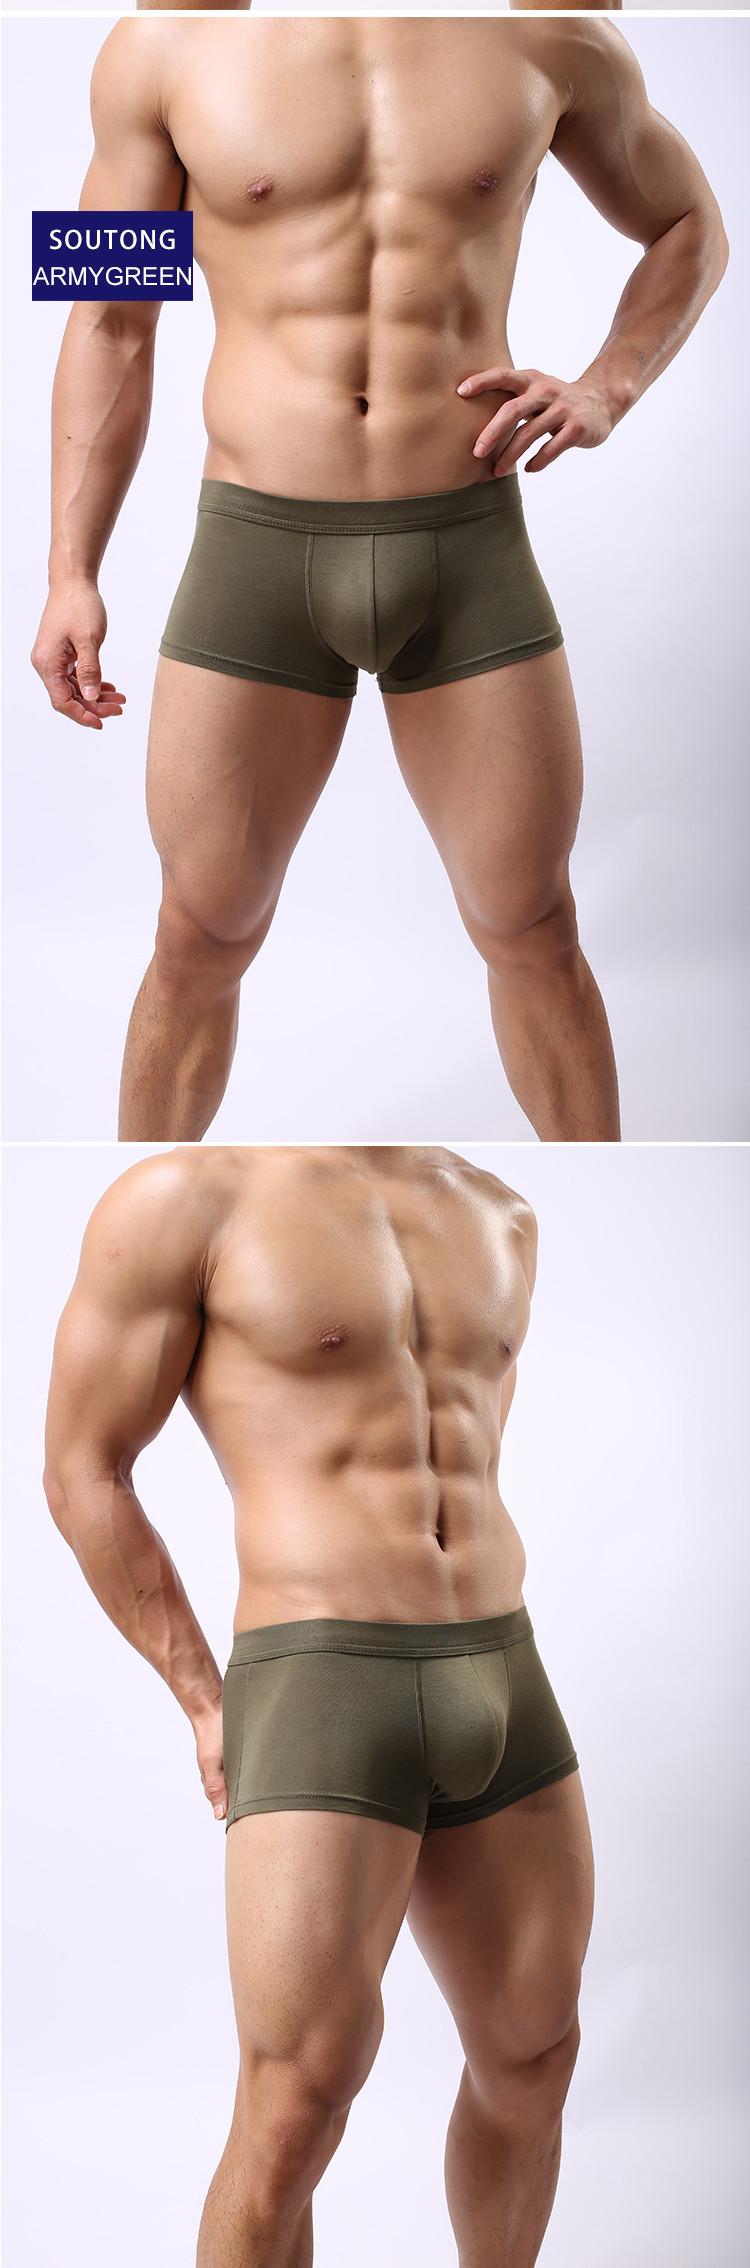 SouTong 2016 New Brand Comfortable Panties Men Male Underwear Men's Boxer Underwear Sexy Man Underwear Boxer Model Underpants